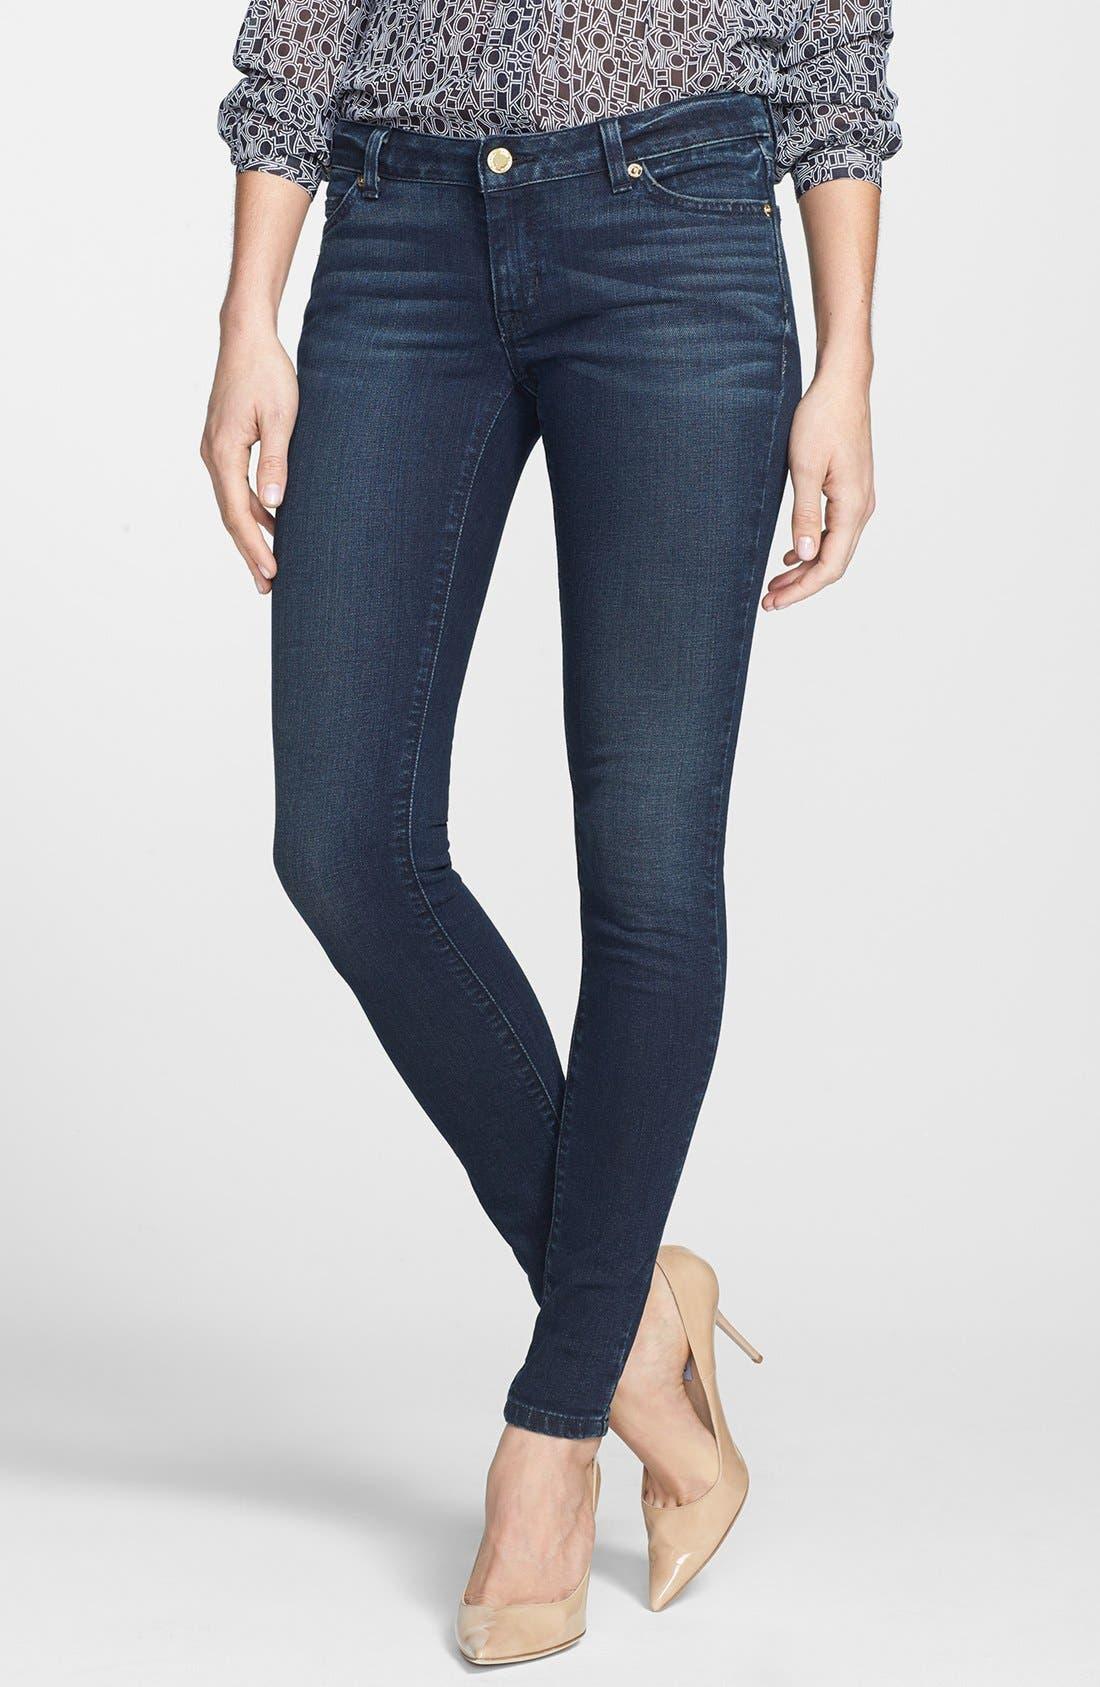 Alternate Image 1 Selected - MICHAEL Michael Kors 'Jetset' Stretch Skinny Jeans (Stellar)